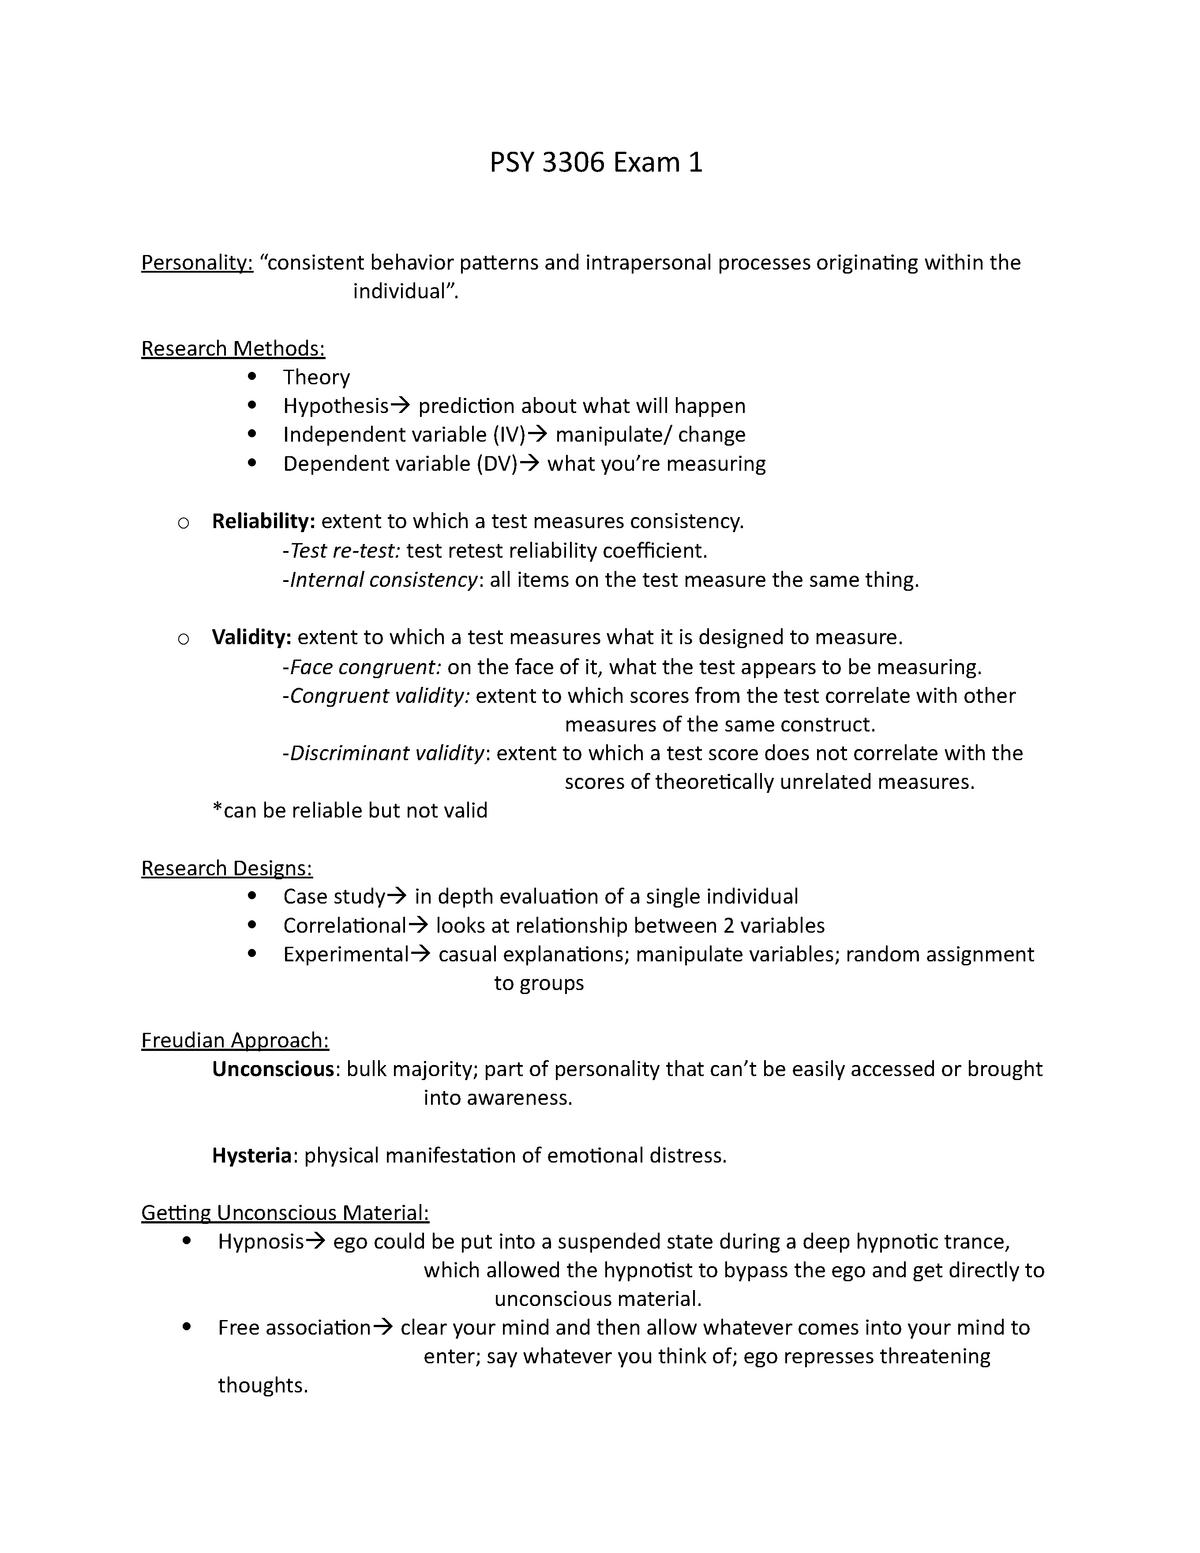 PSY 3306 Exam 1 - PSY 3306: Personality - StuDocu